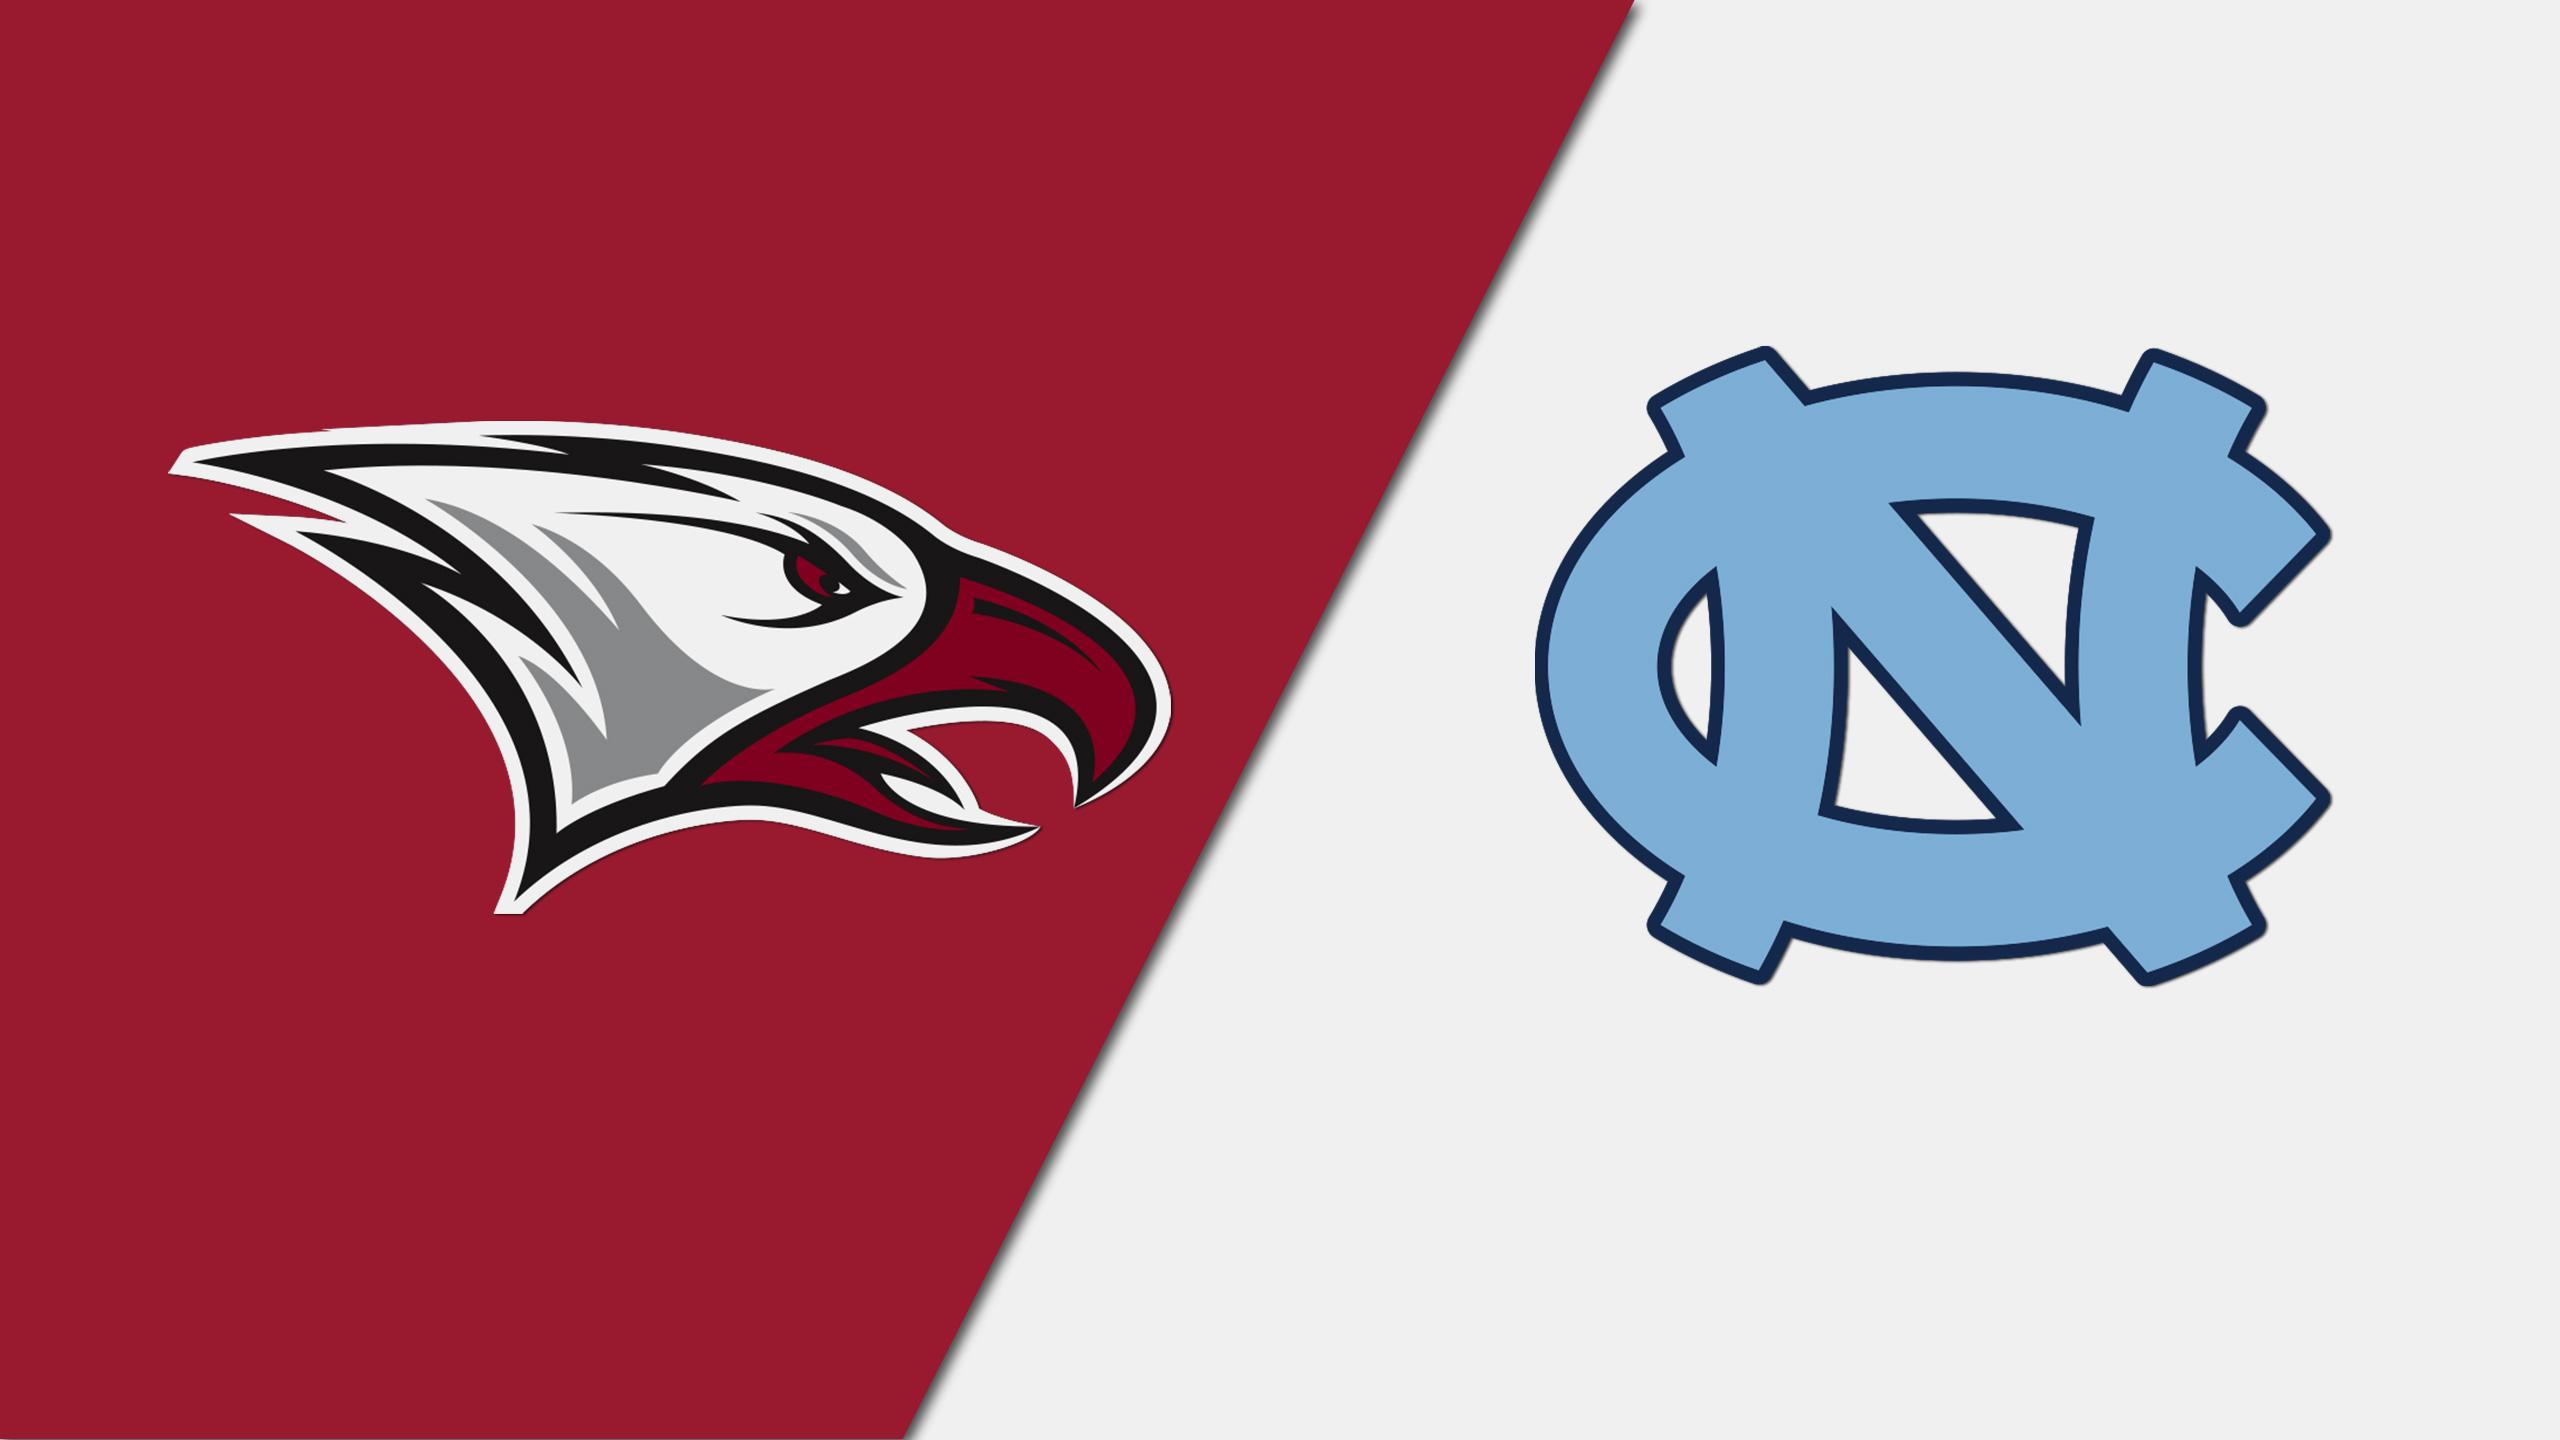 North Carolina Central vs. North Carolina